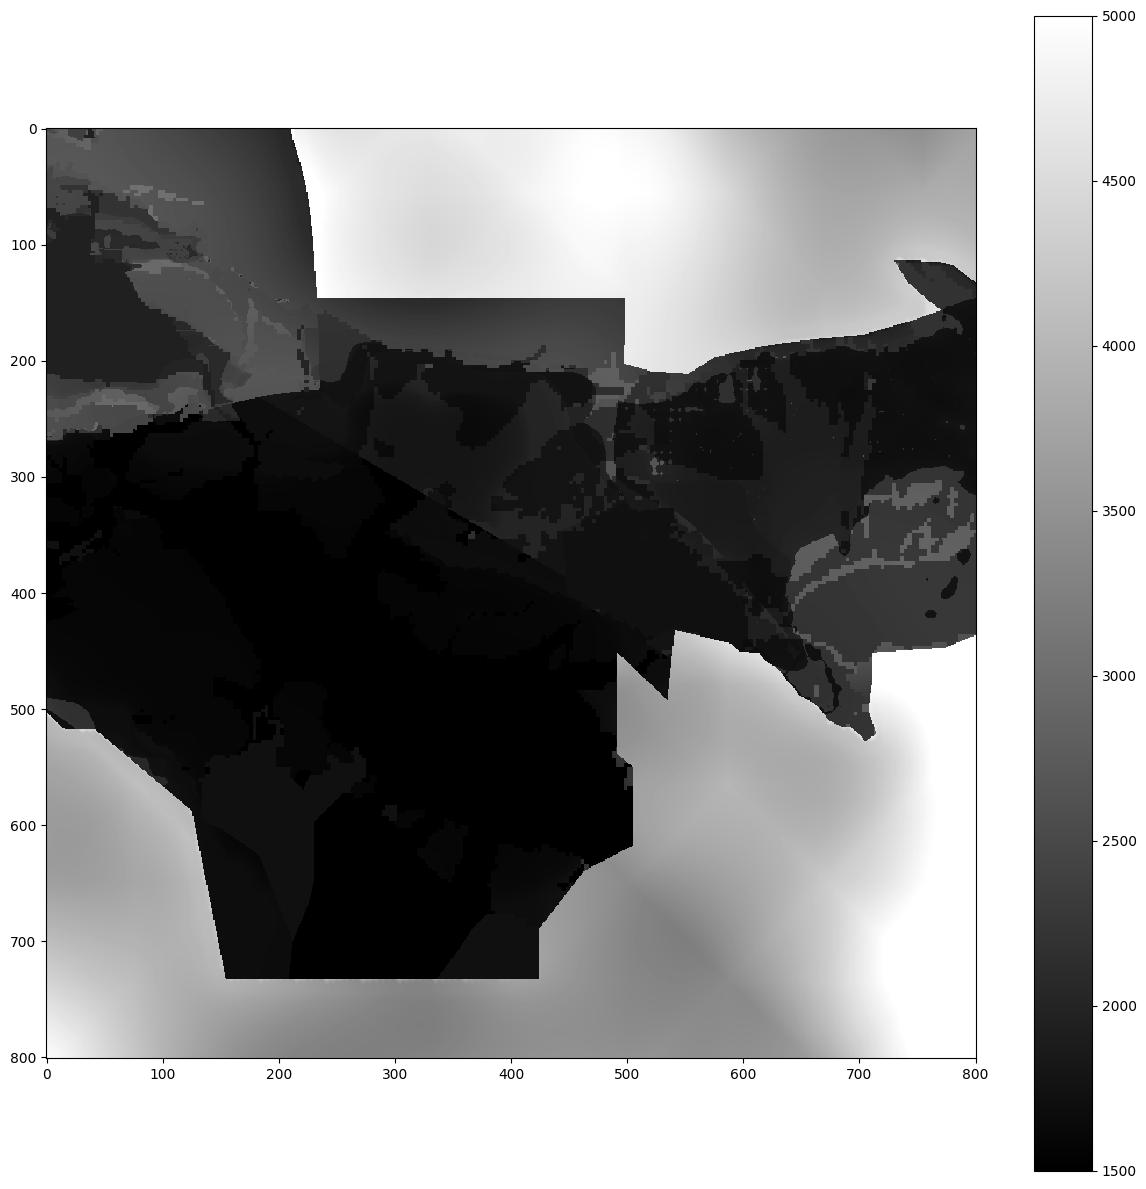 bench/seismic/wp/la_habra/meshes/velocity_model/plots/vp_100.png